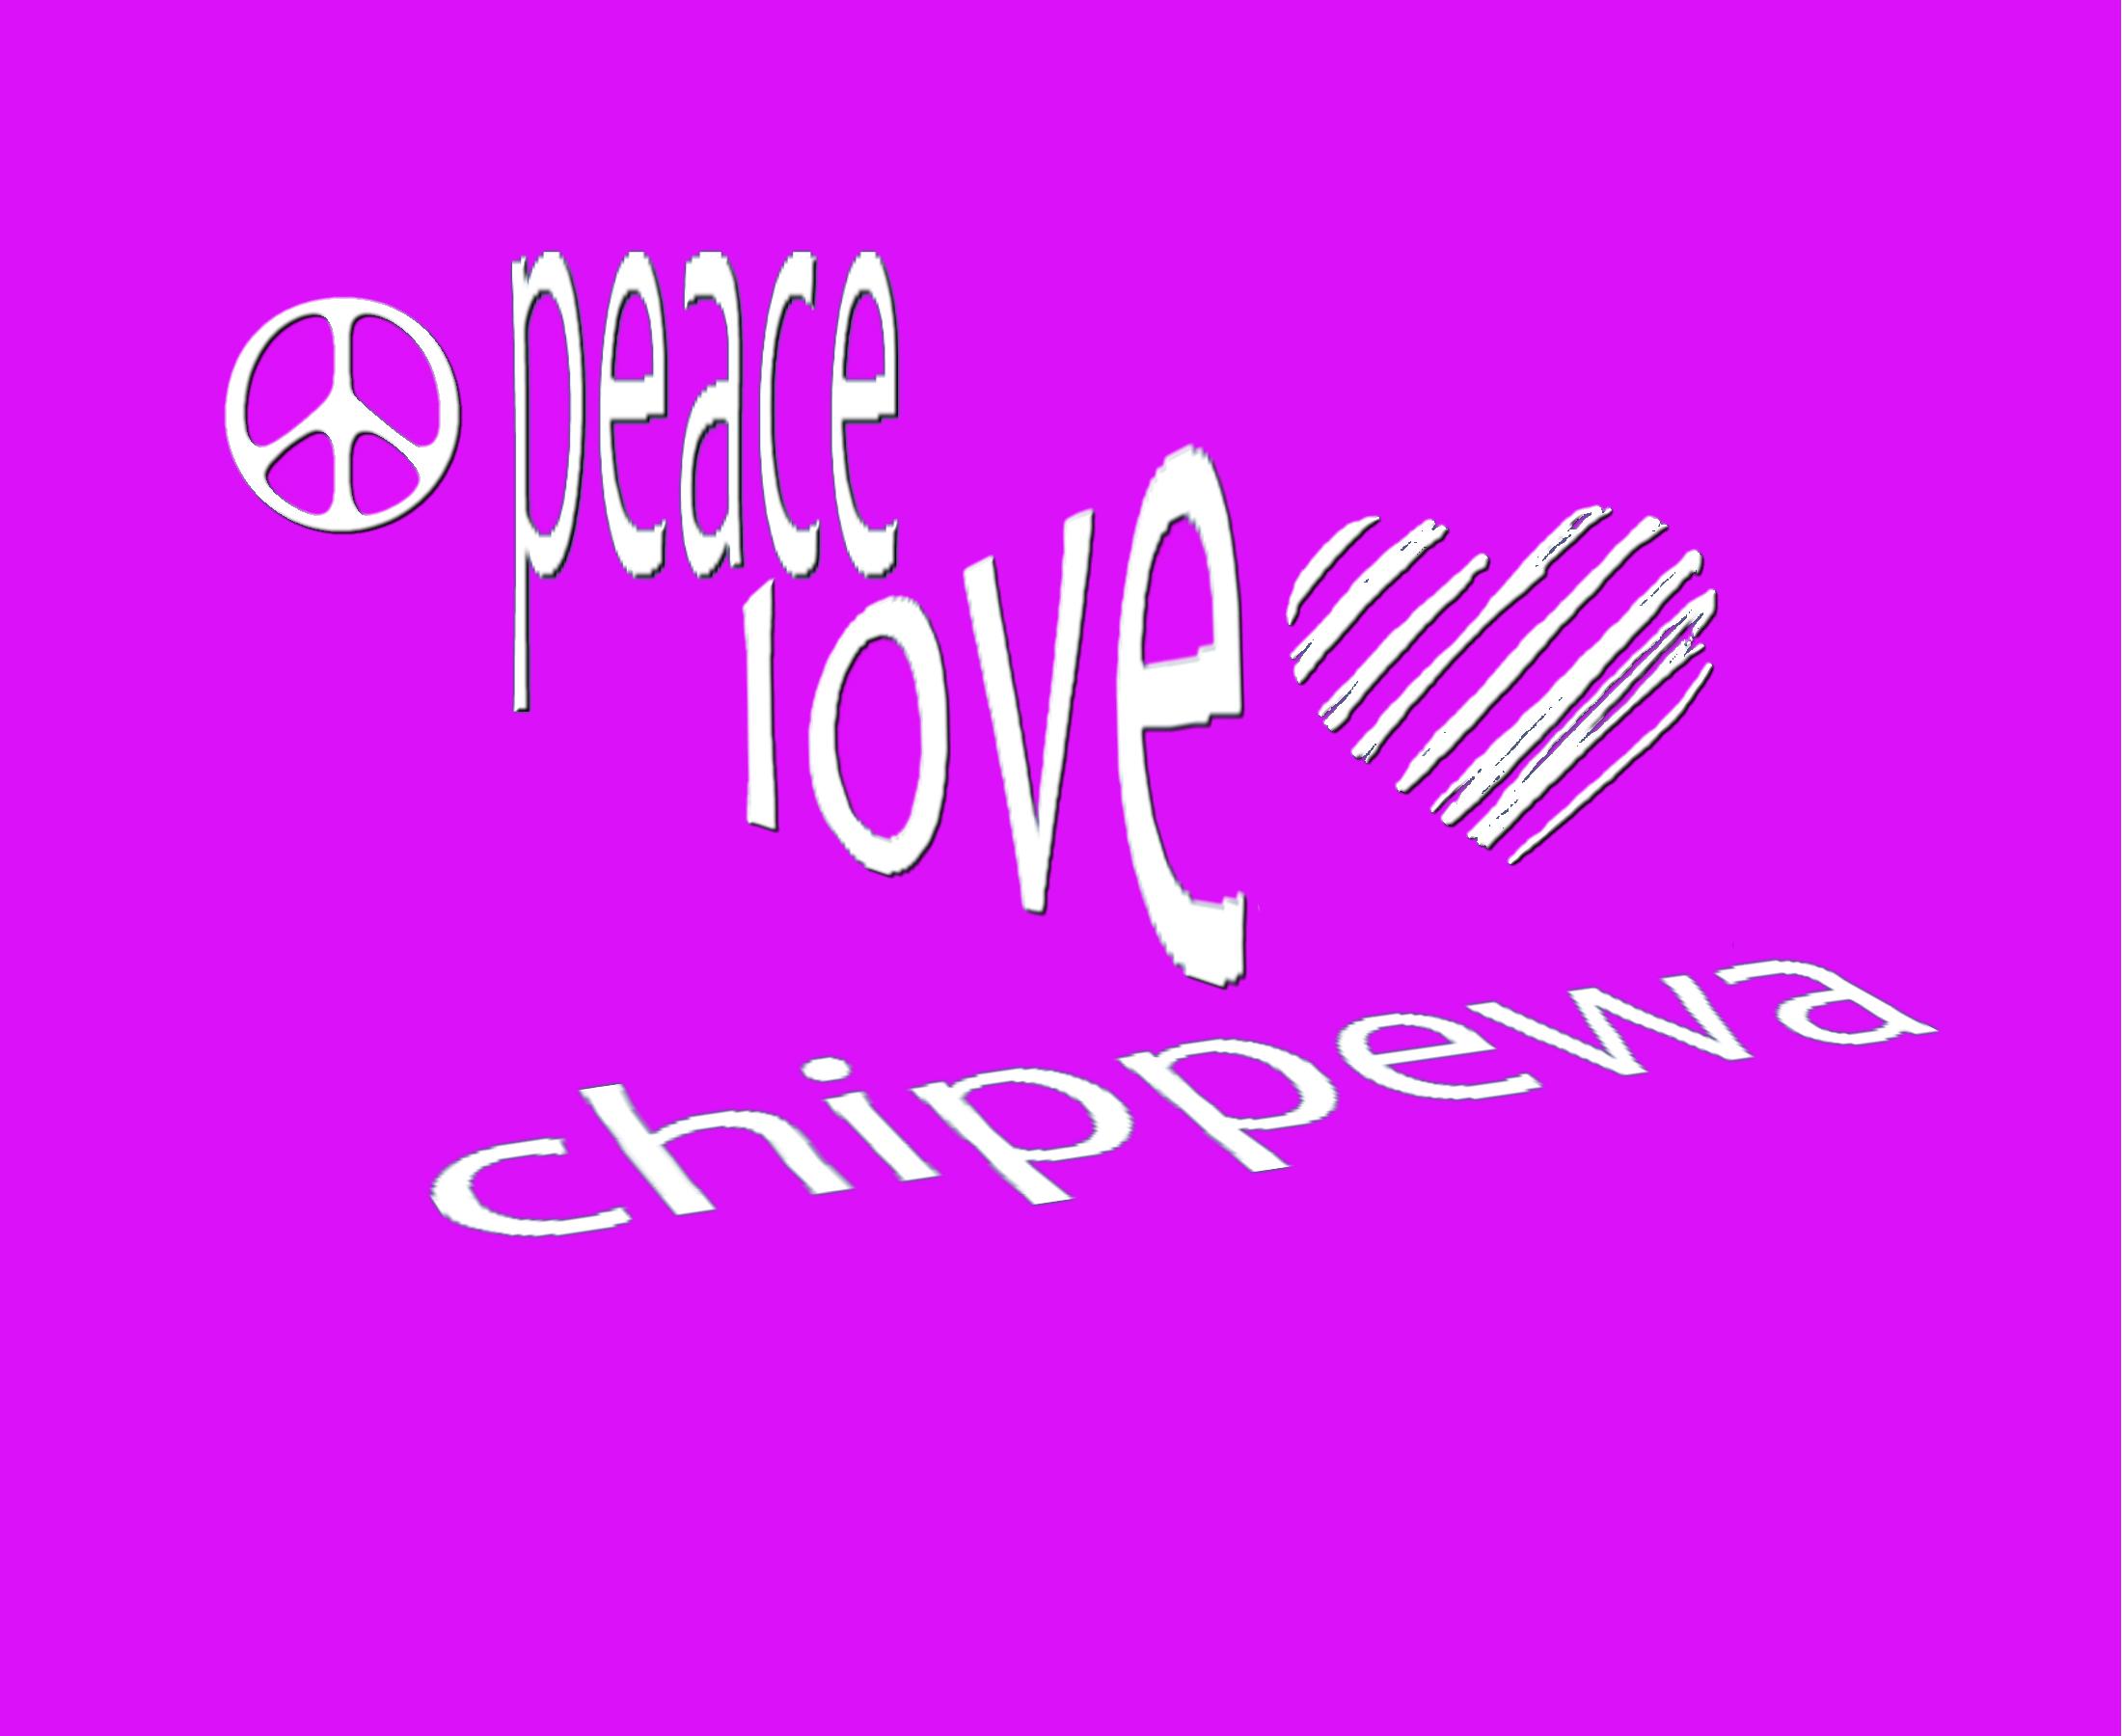 PEACE...LOVE...CHIPPEWA (2)